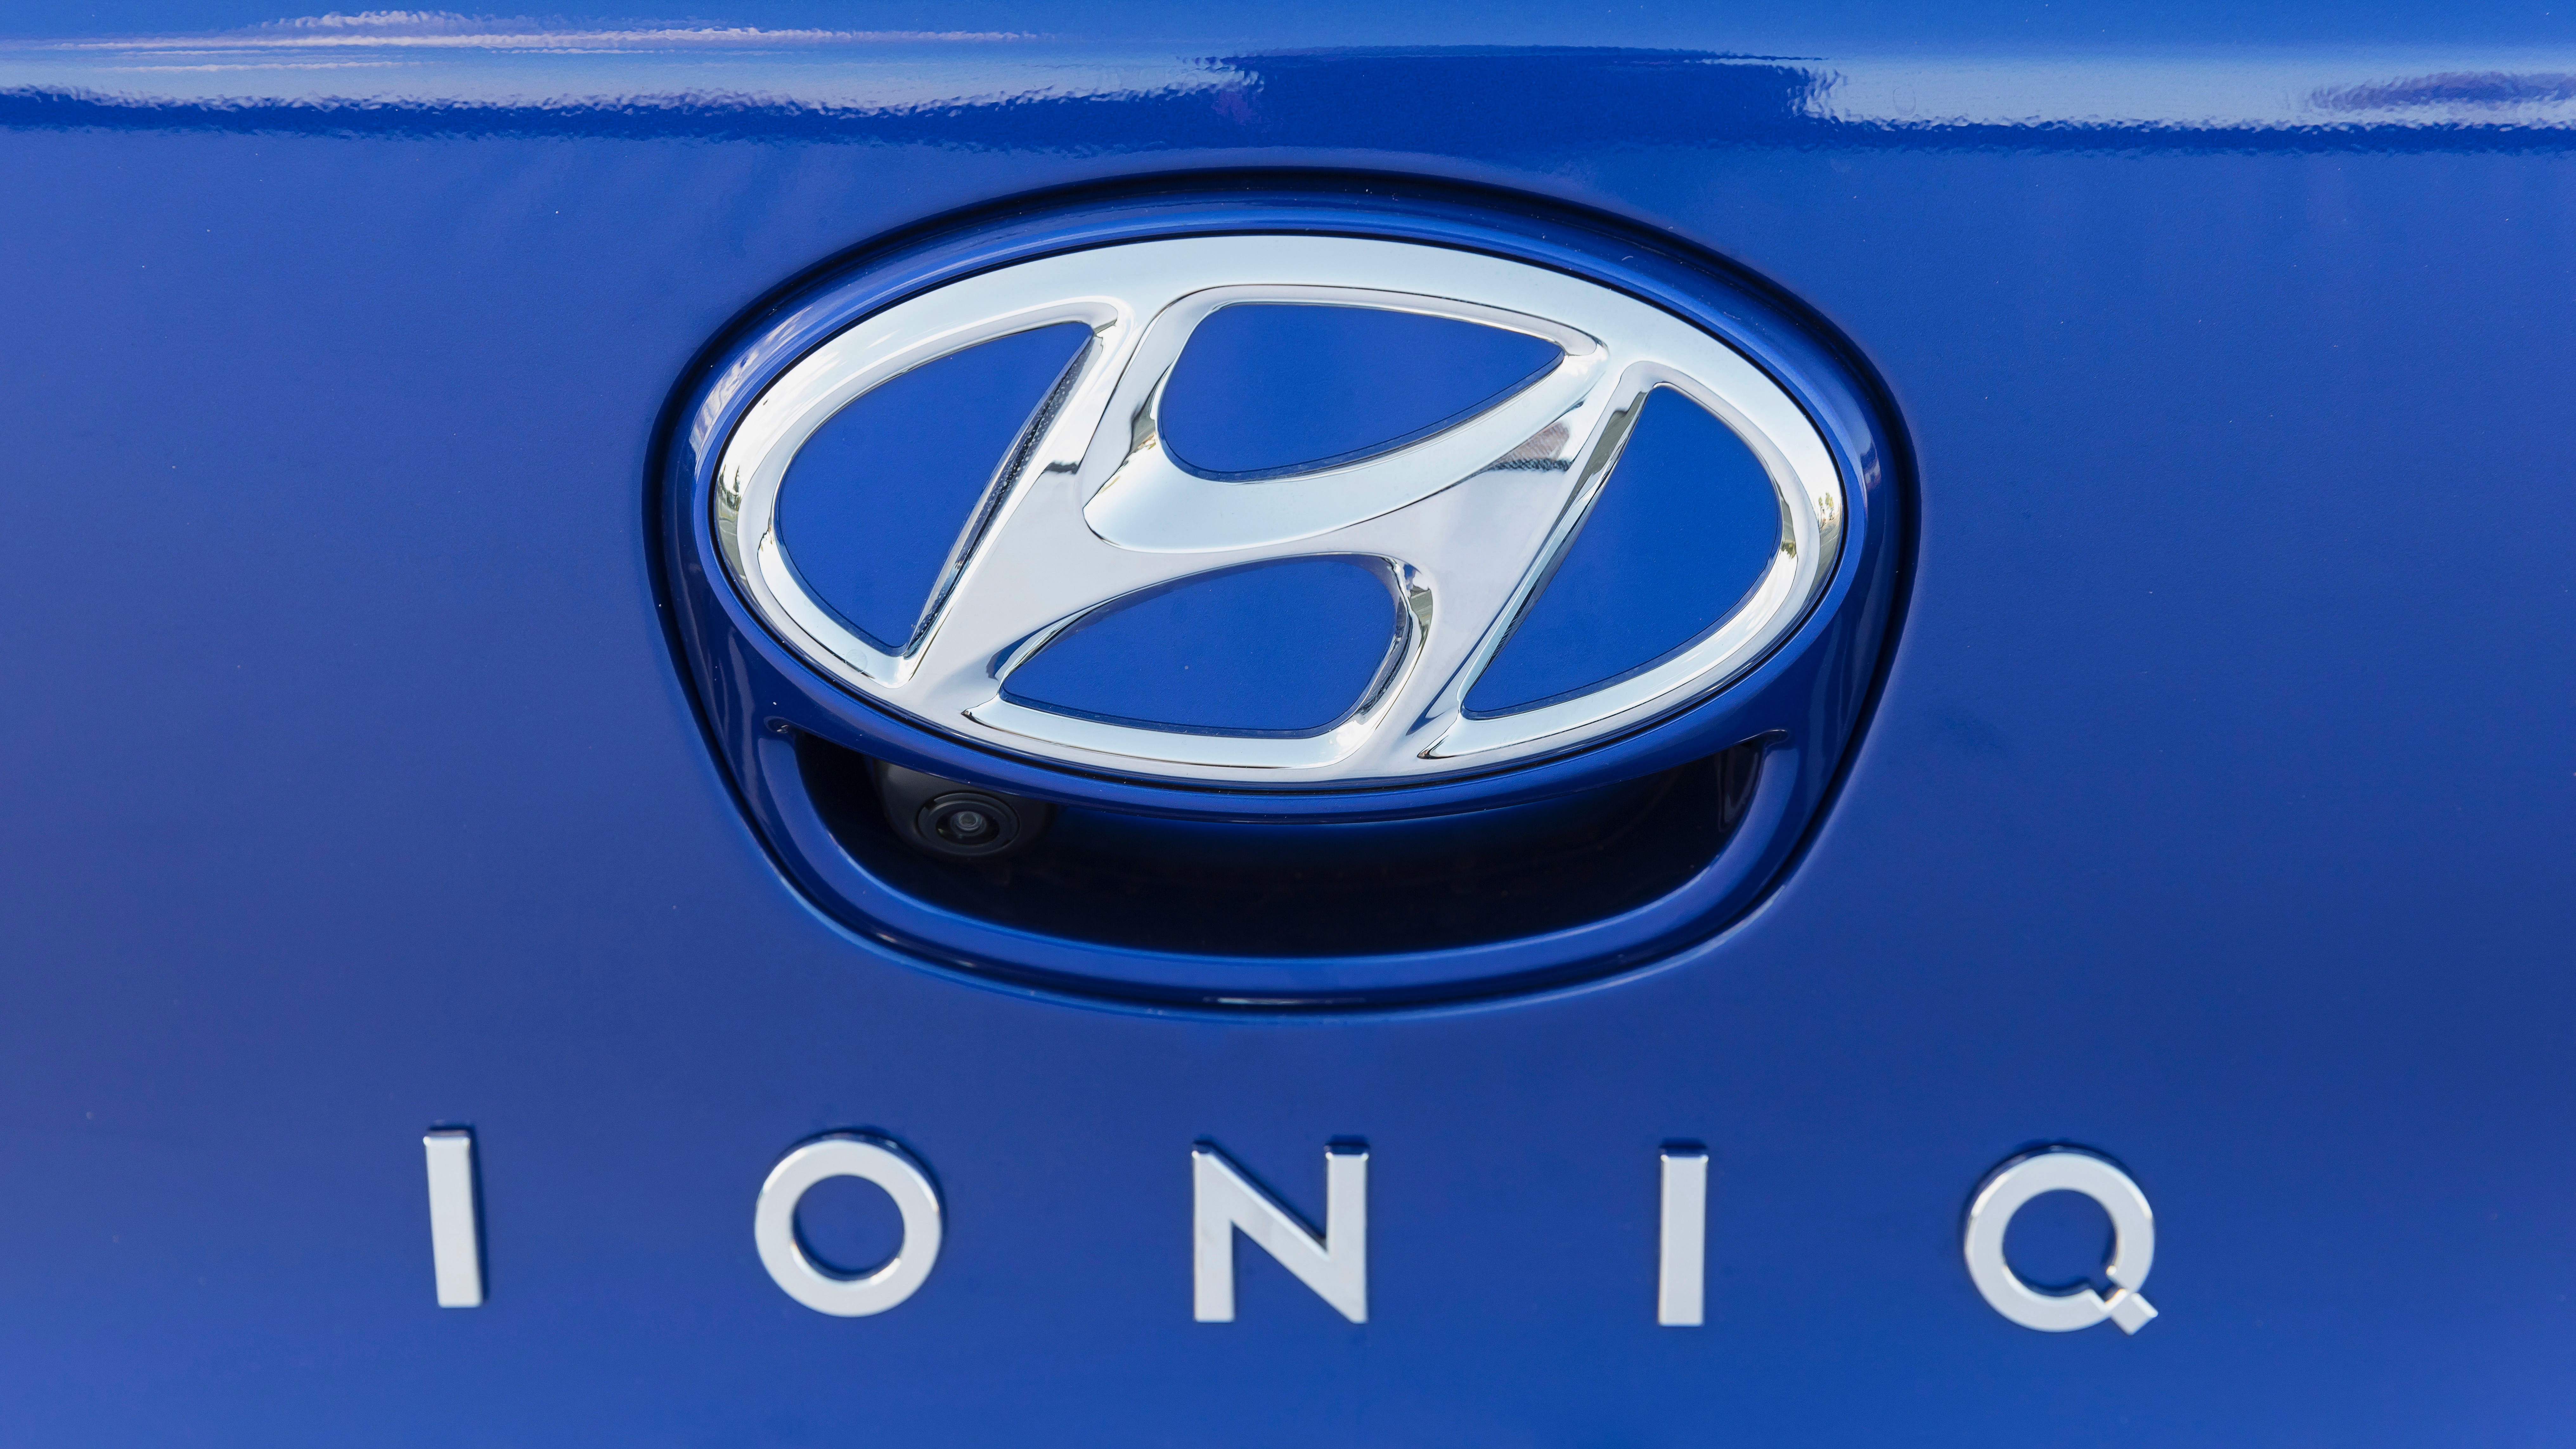 2019 Hyundai Ioniq badge